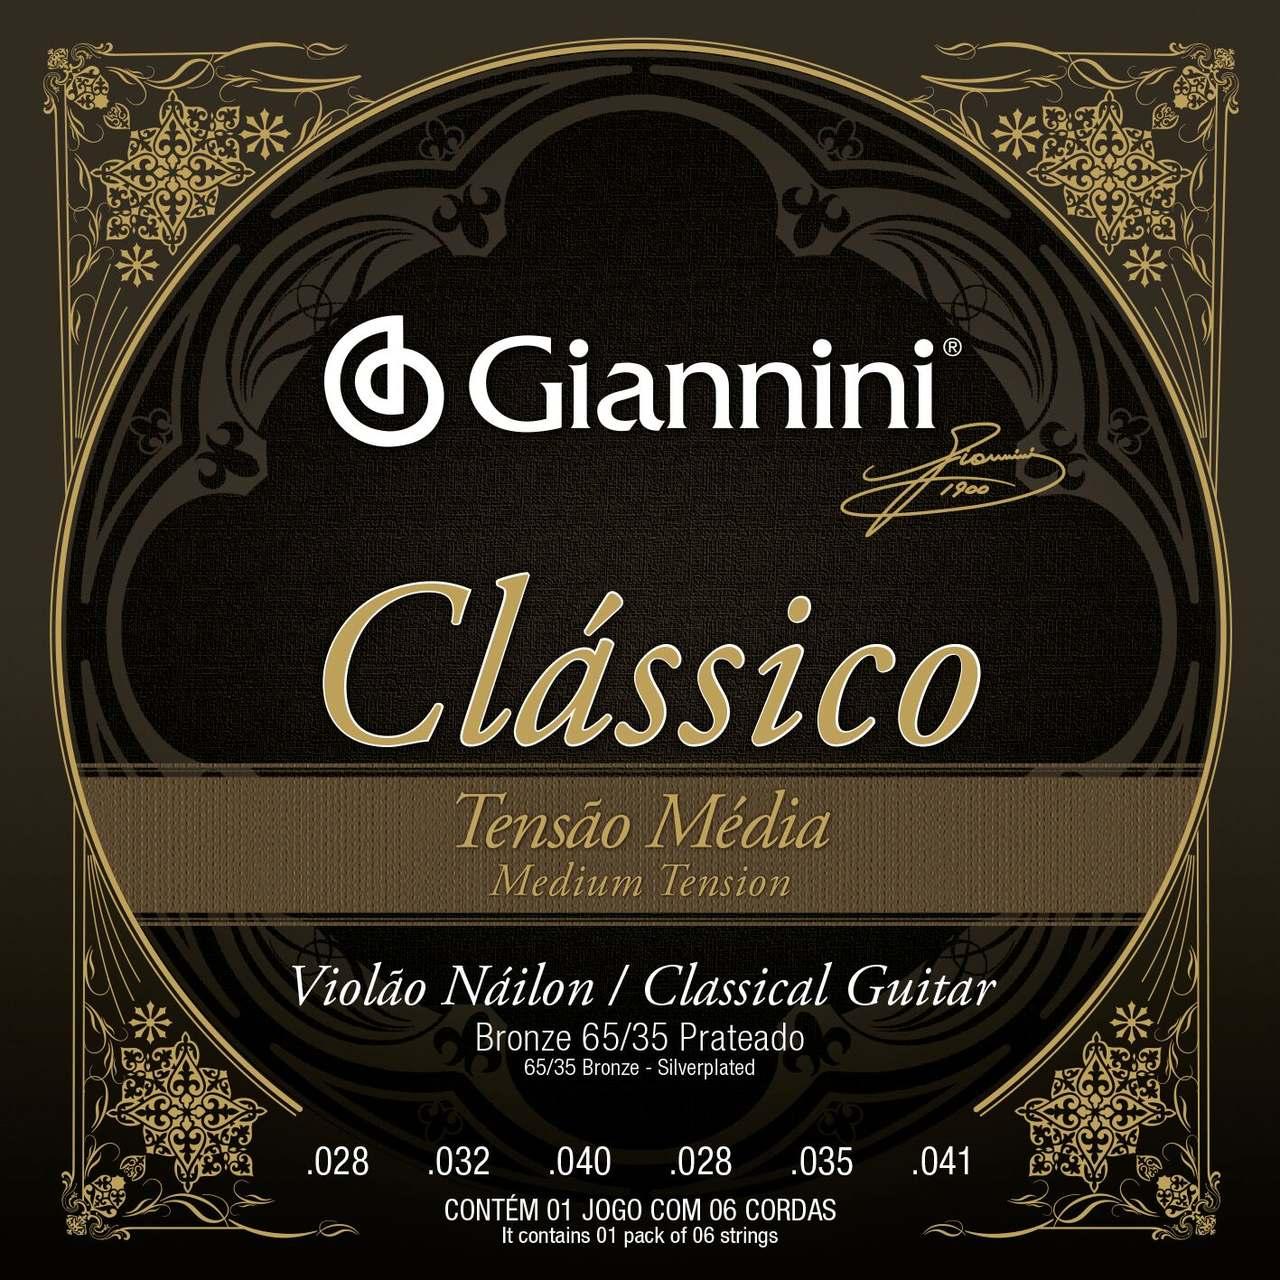 Encordoamento p/Violão Nylon Giannini 65/35 Prateado MED - GENWPM